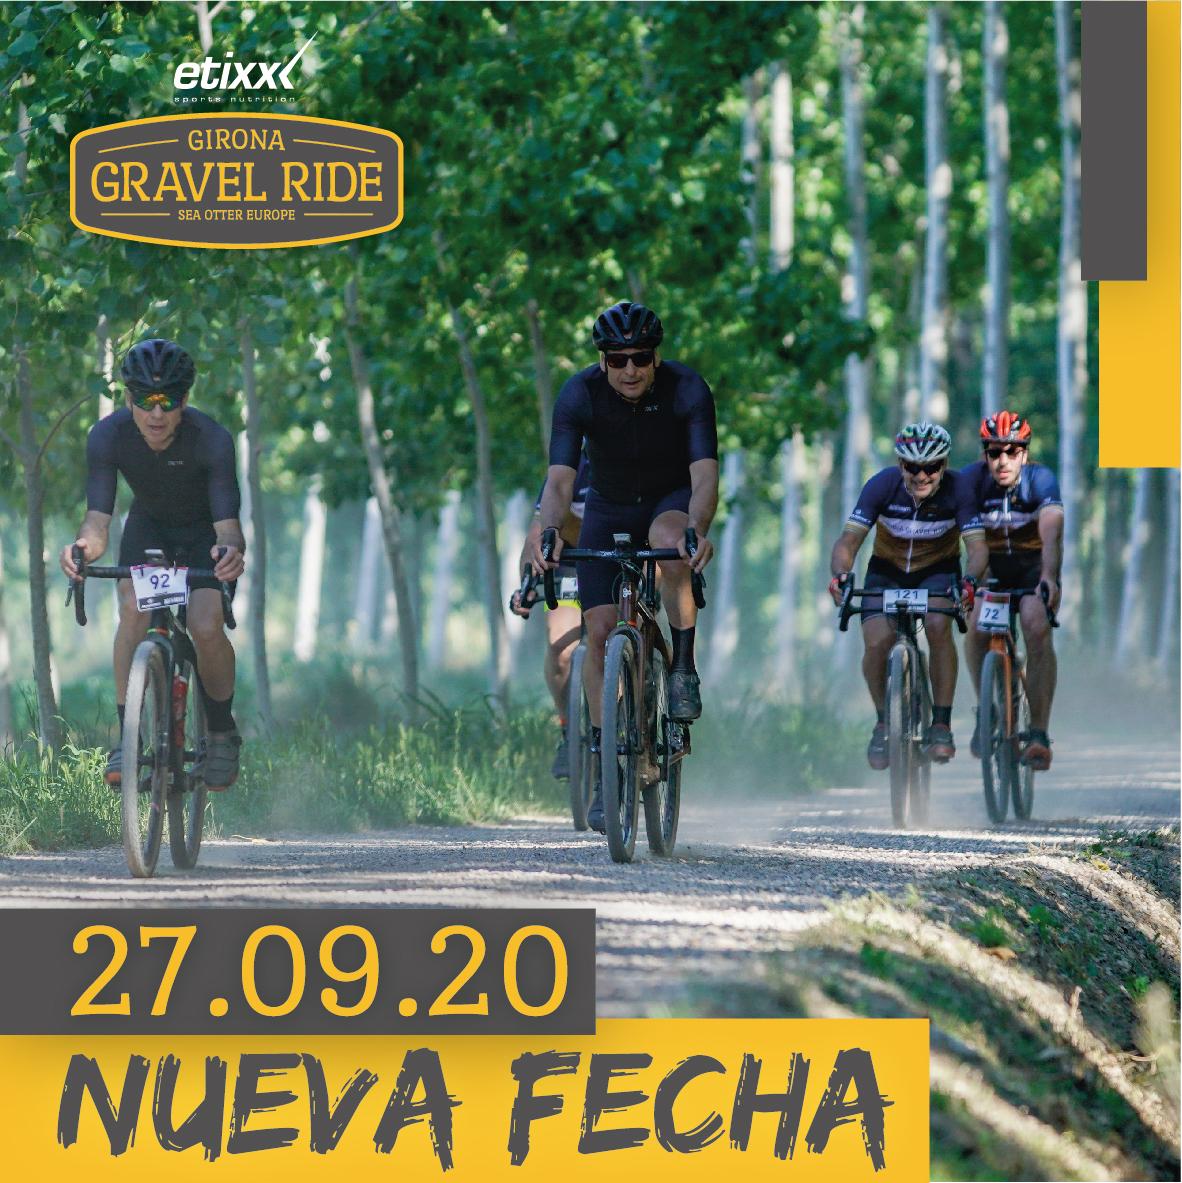 El festival ciclista Sea Otter Europe Costa Brava-Girona Bike Show 2020 s'ajorna i es farà del 25 al 27 de setembre